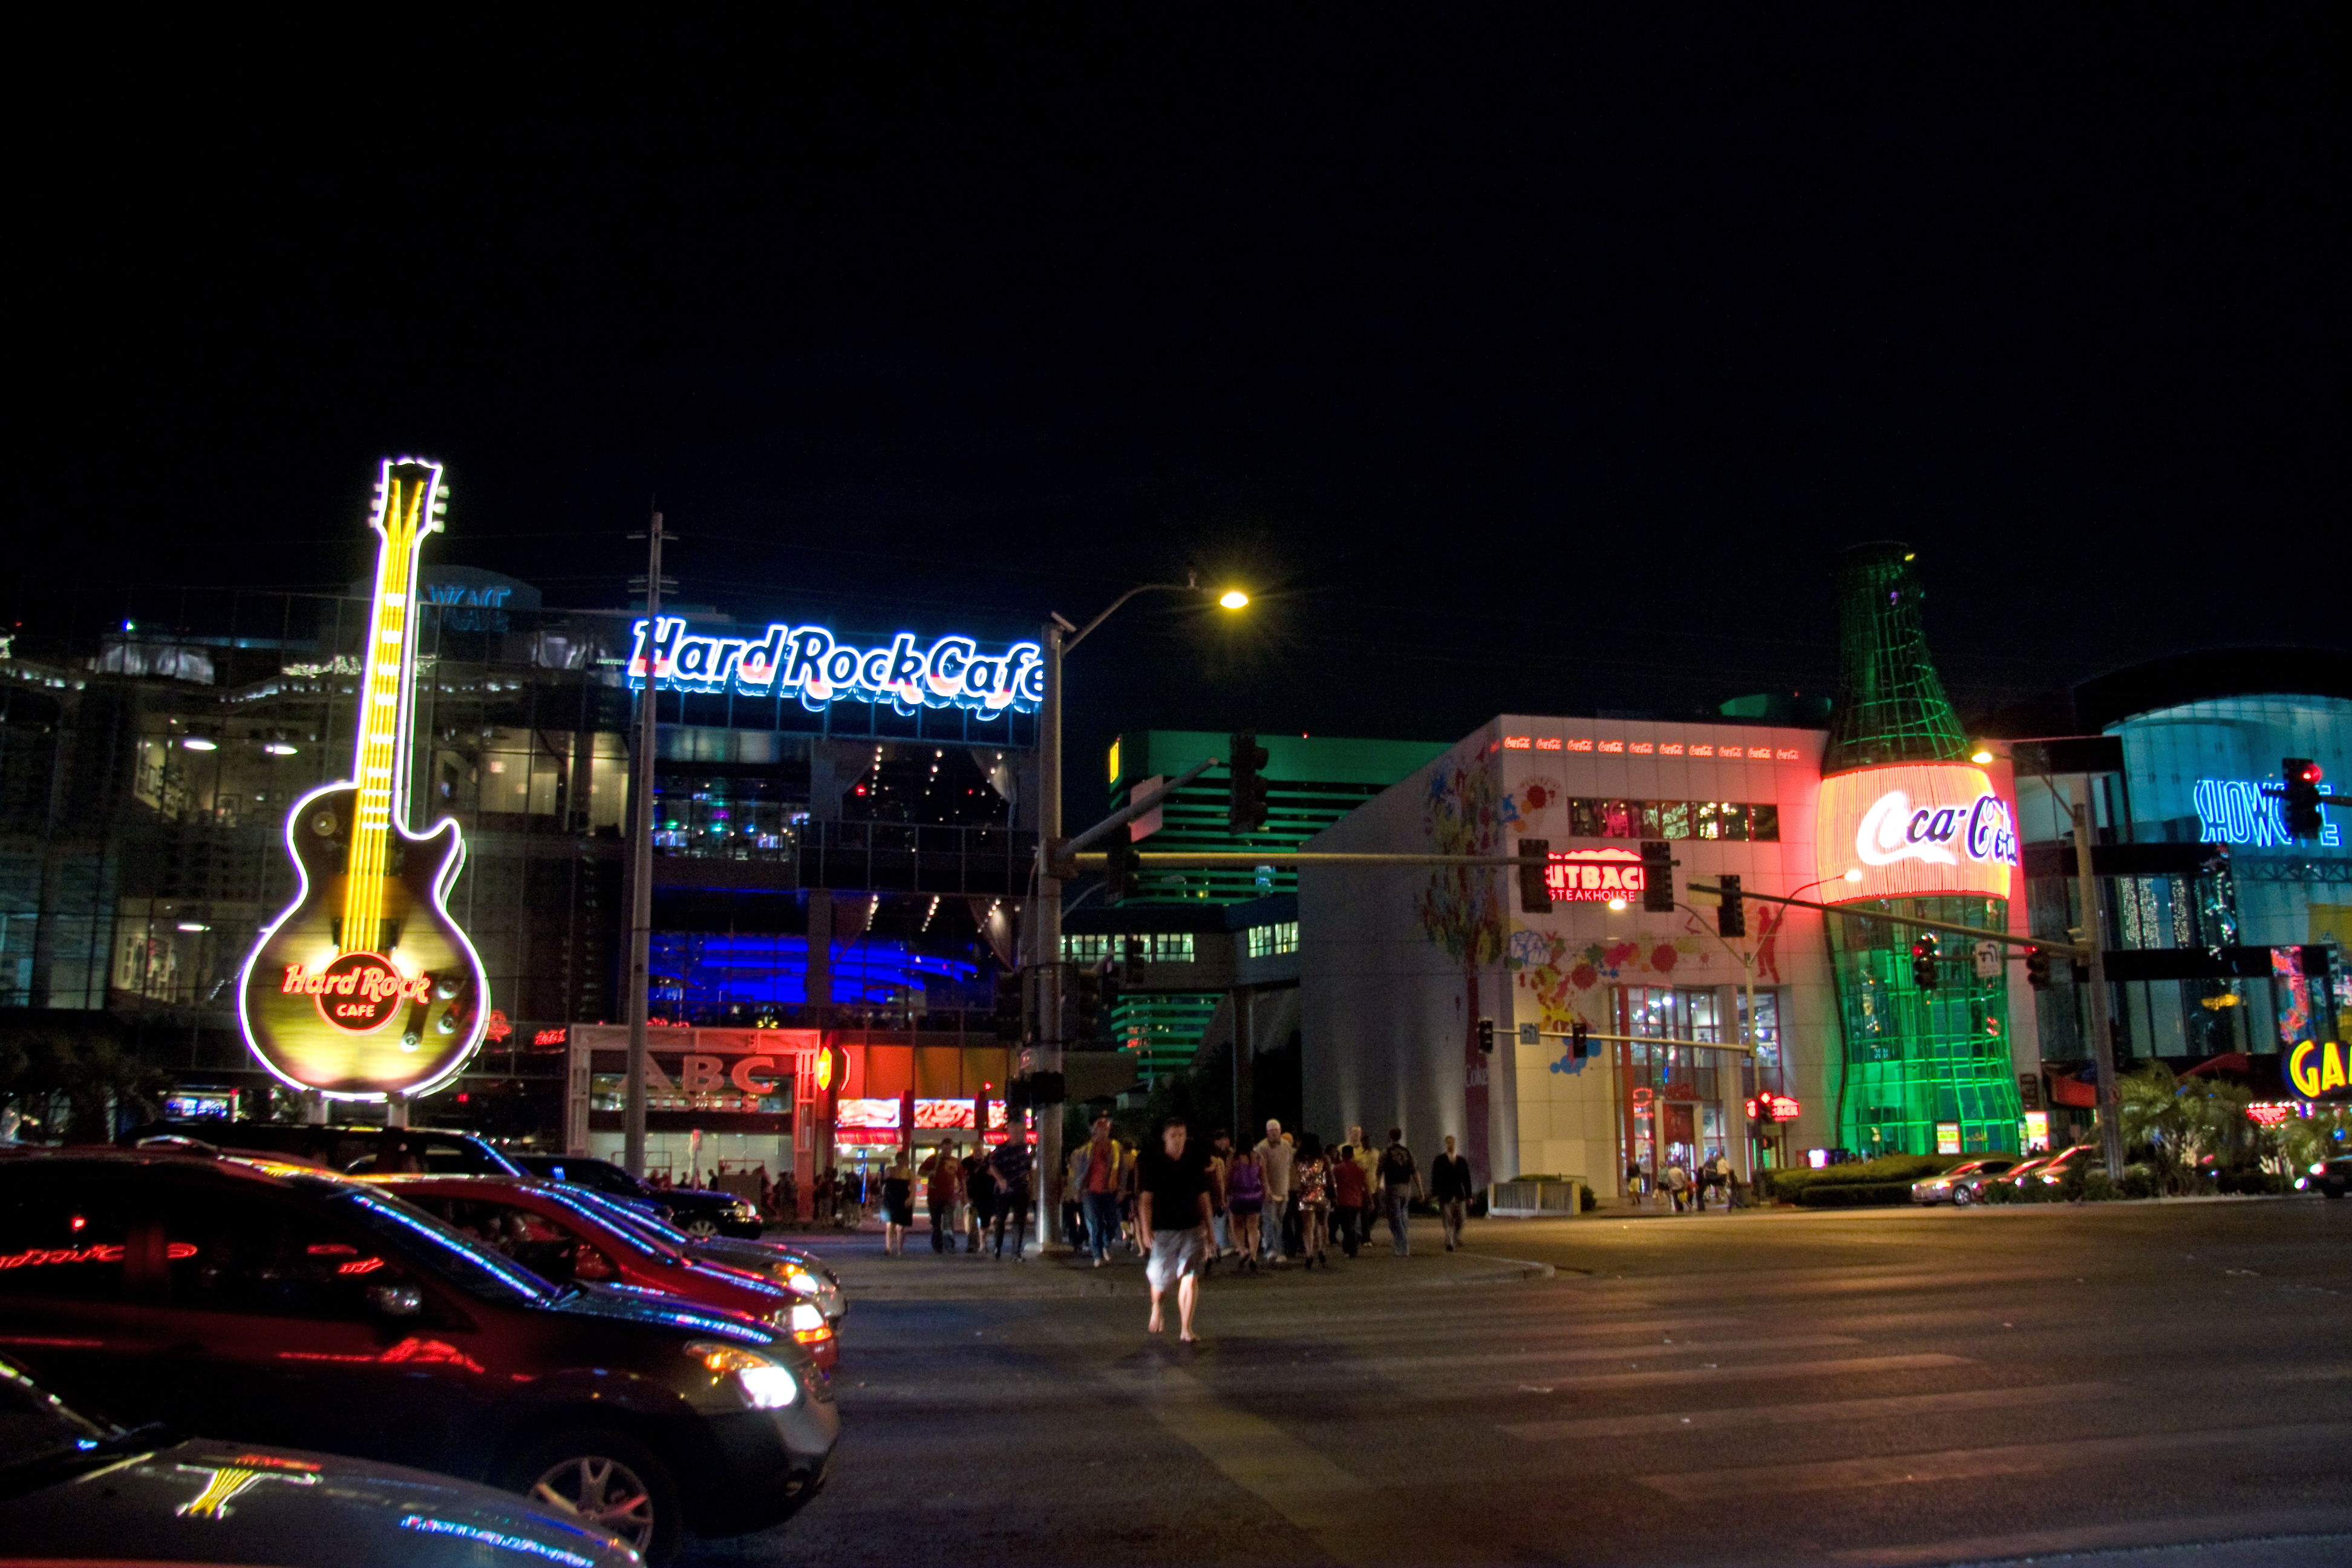 The Hard Rock Cafe Las Vegas